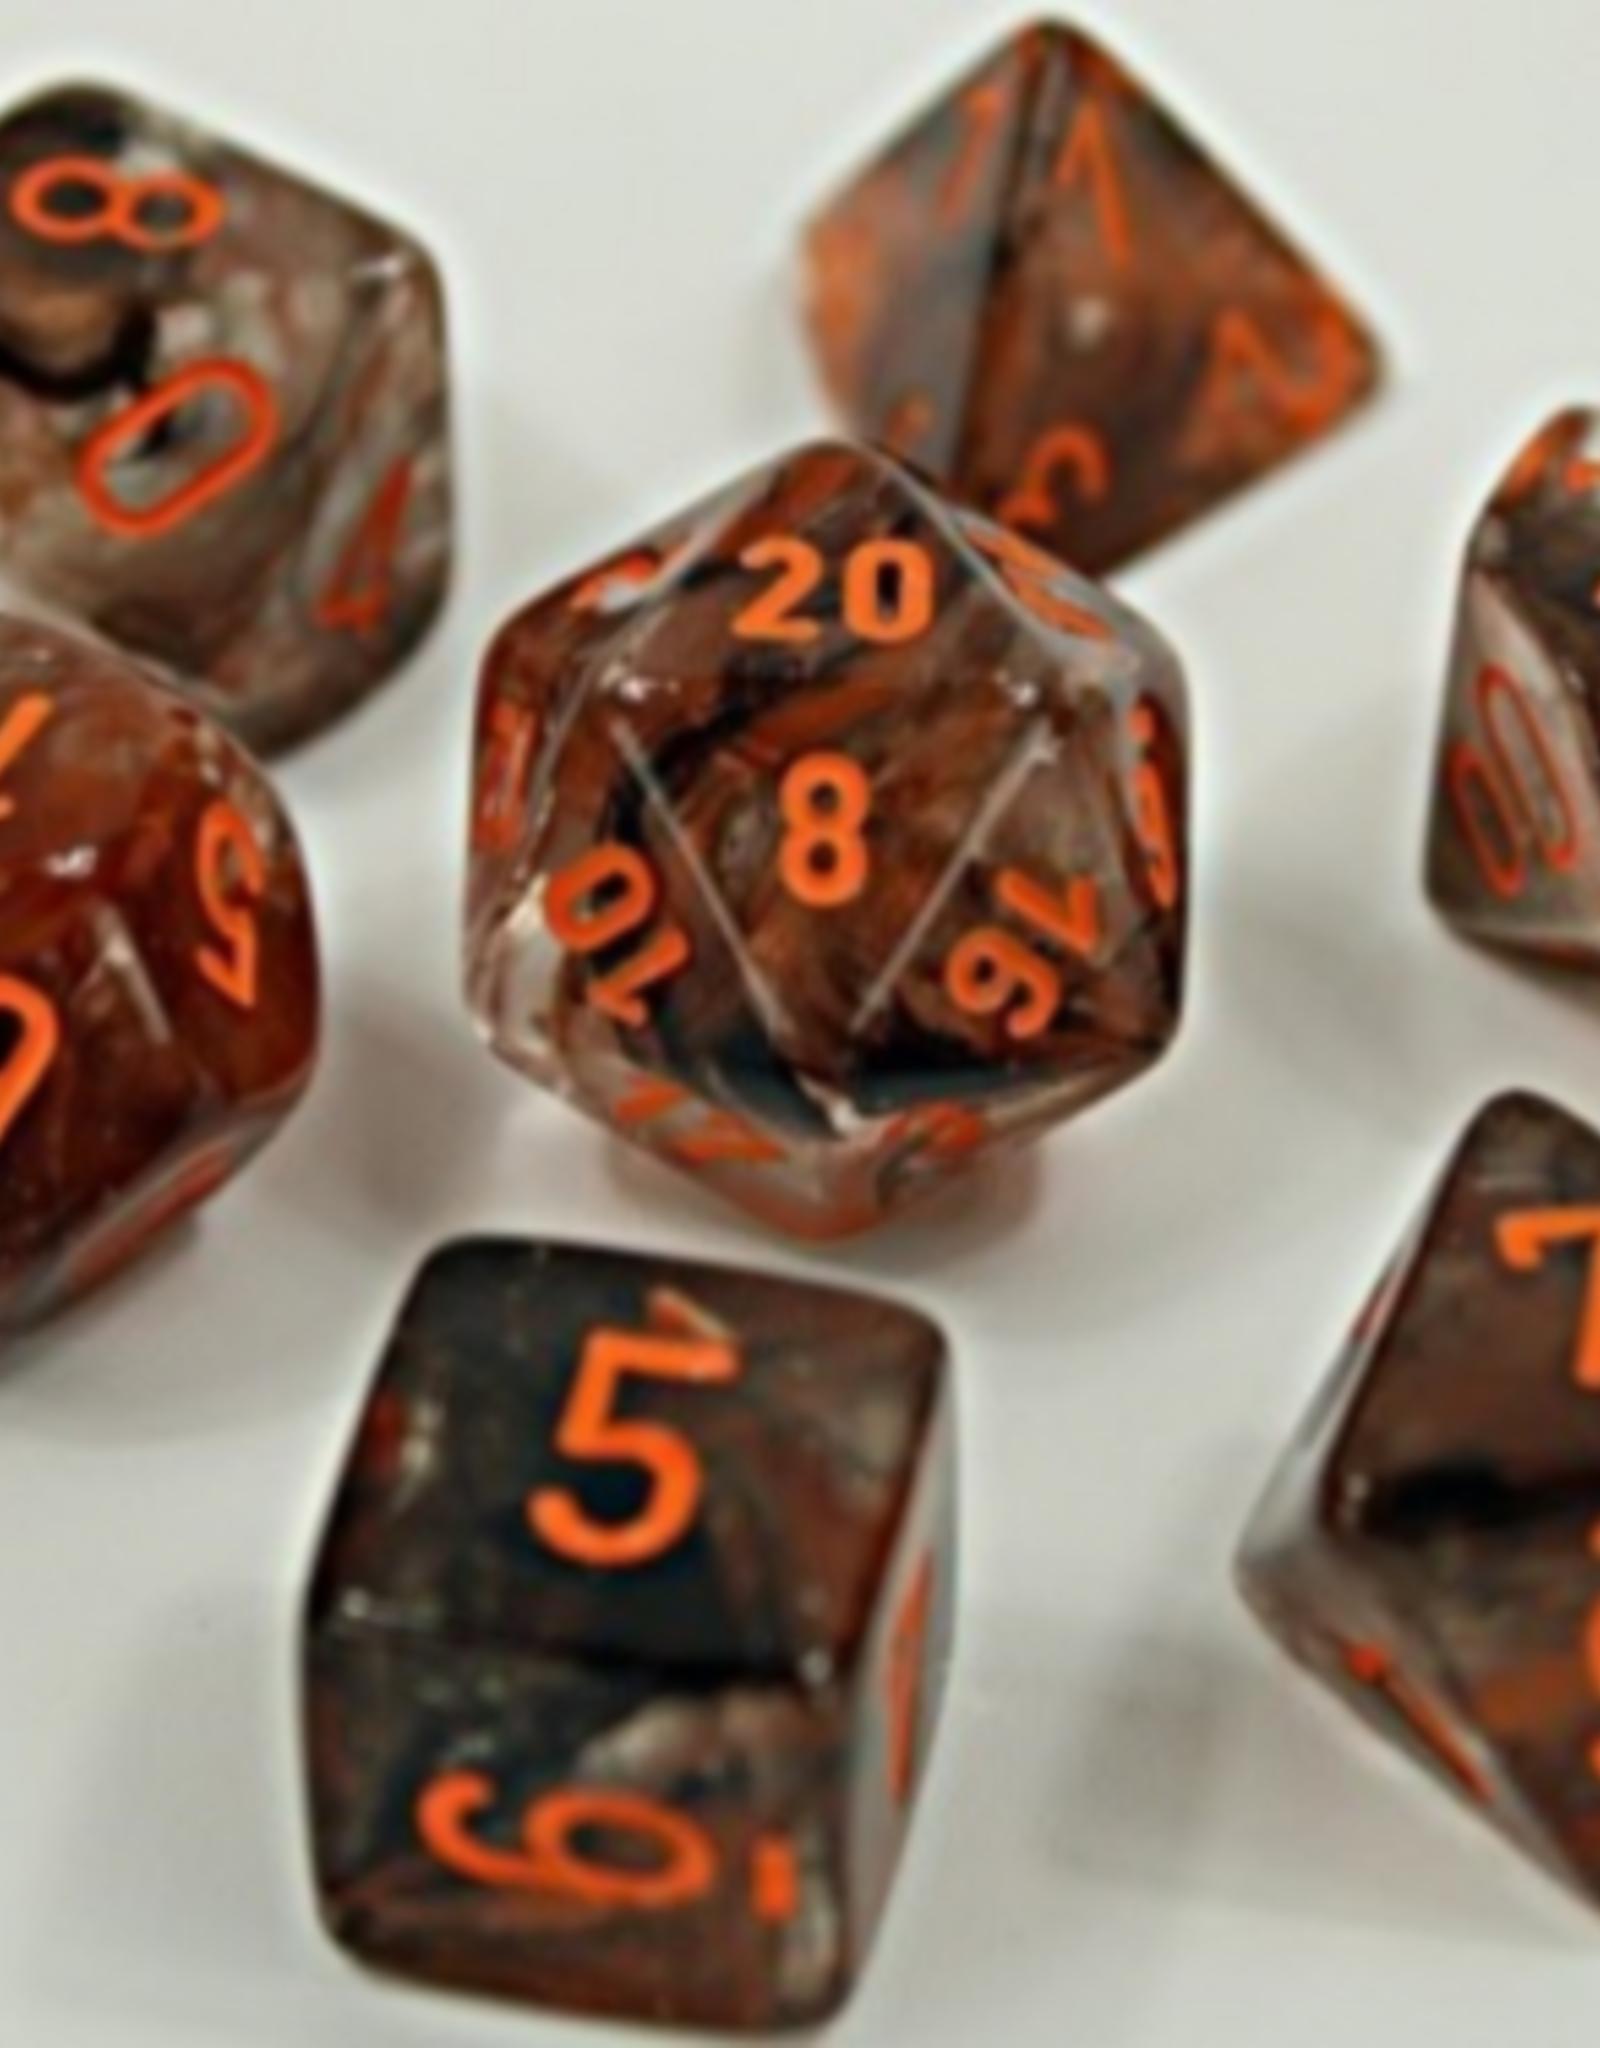 Chessex Dice Block 7ct. - Nebula Copper-Matrix/Orange Glow